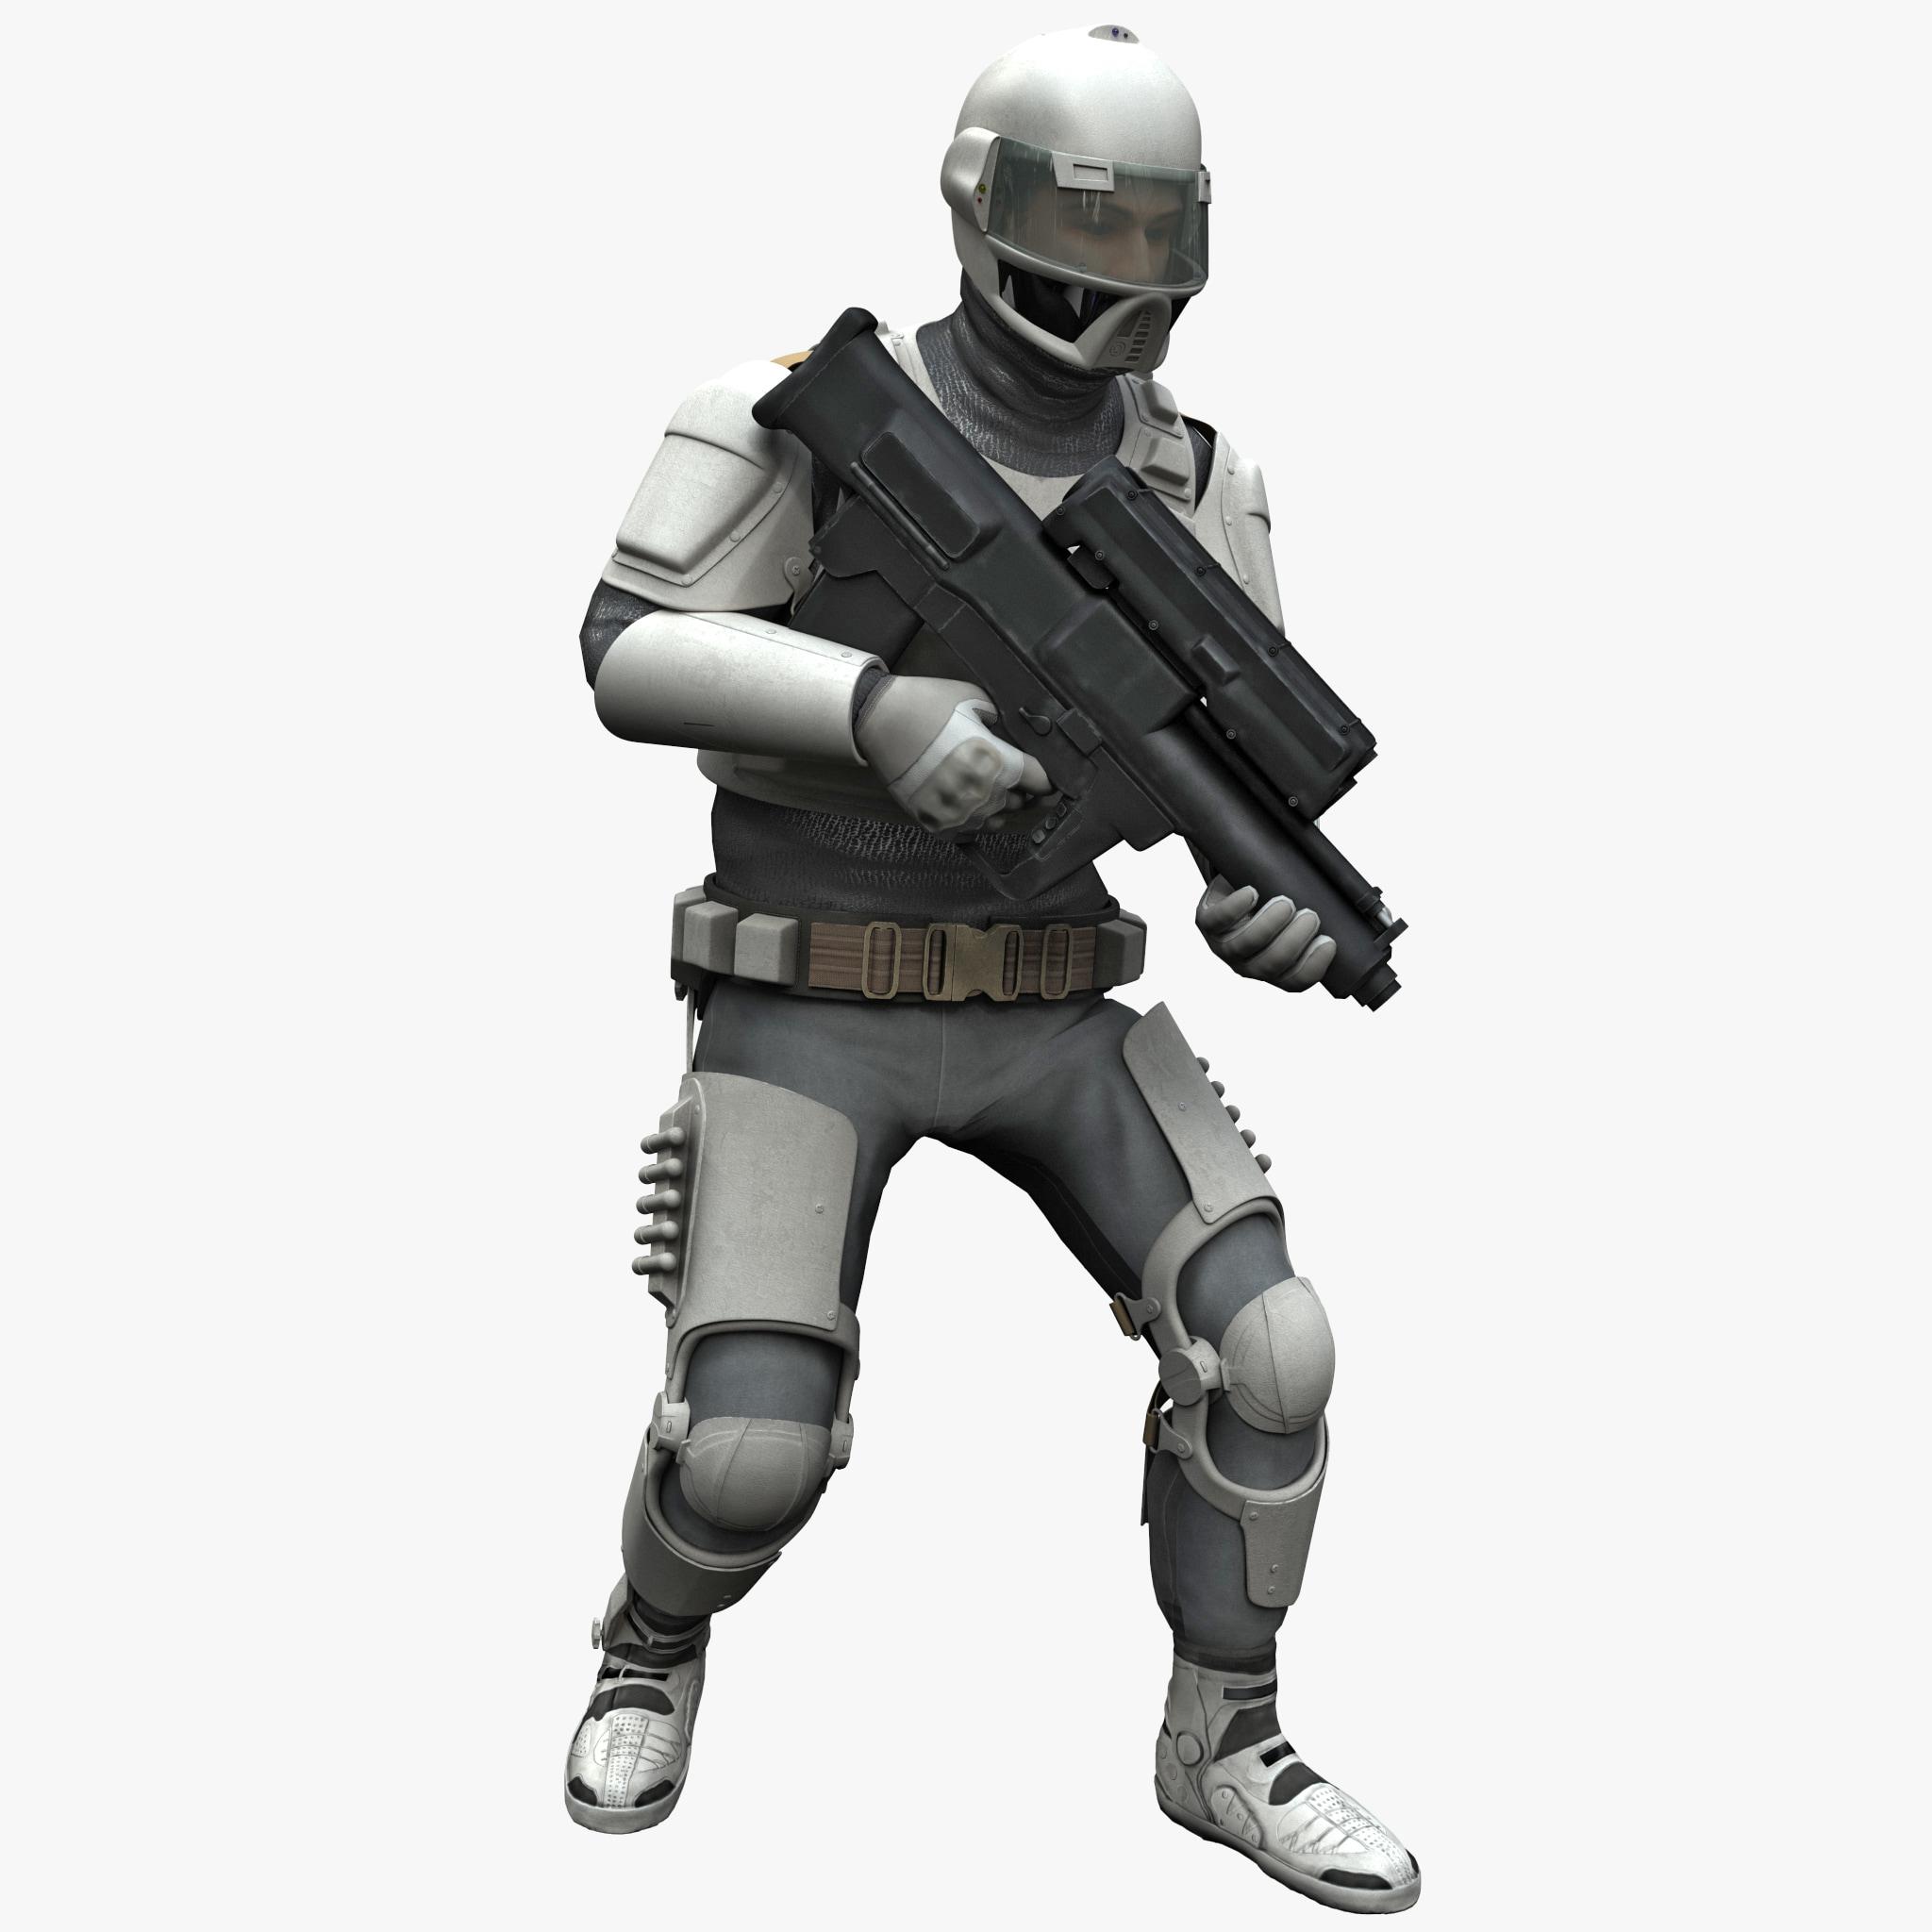 Futuristic Army Solider Pose 2_202.jpg